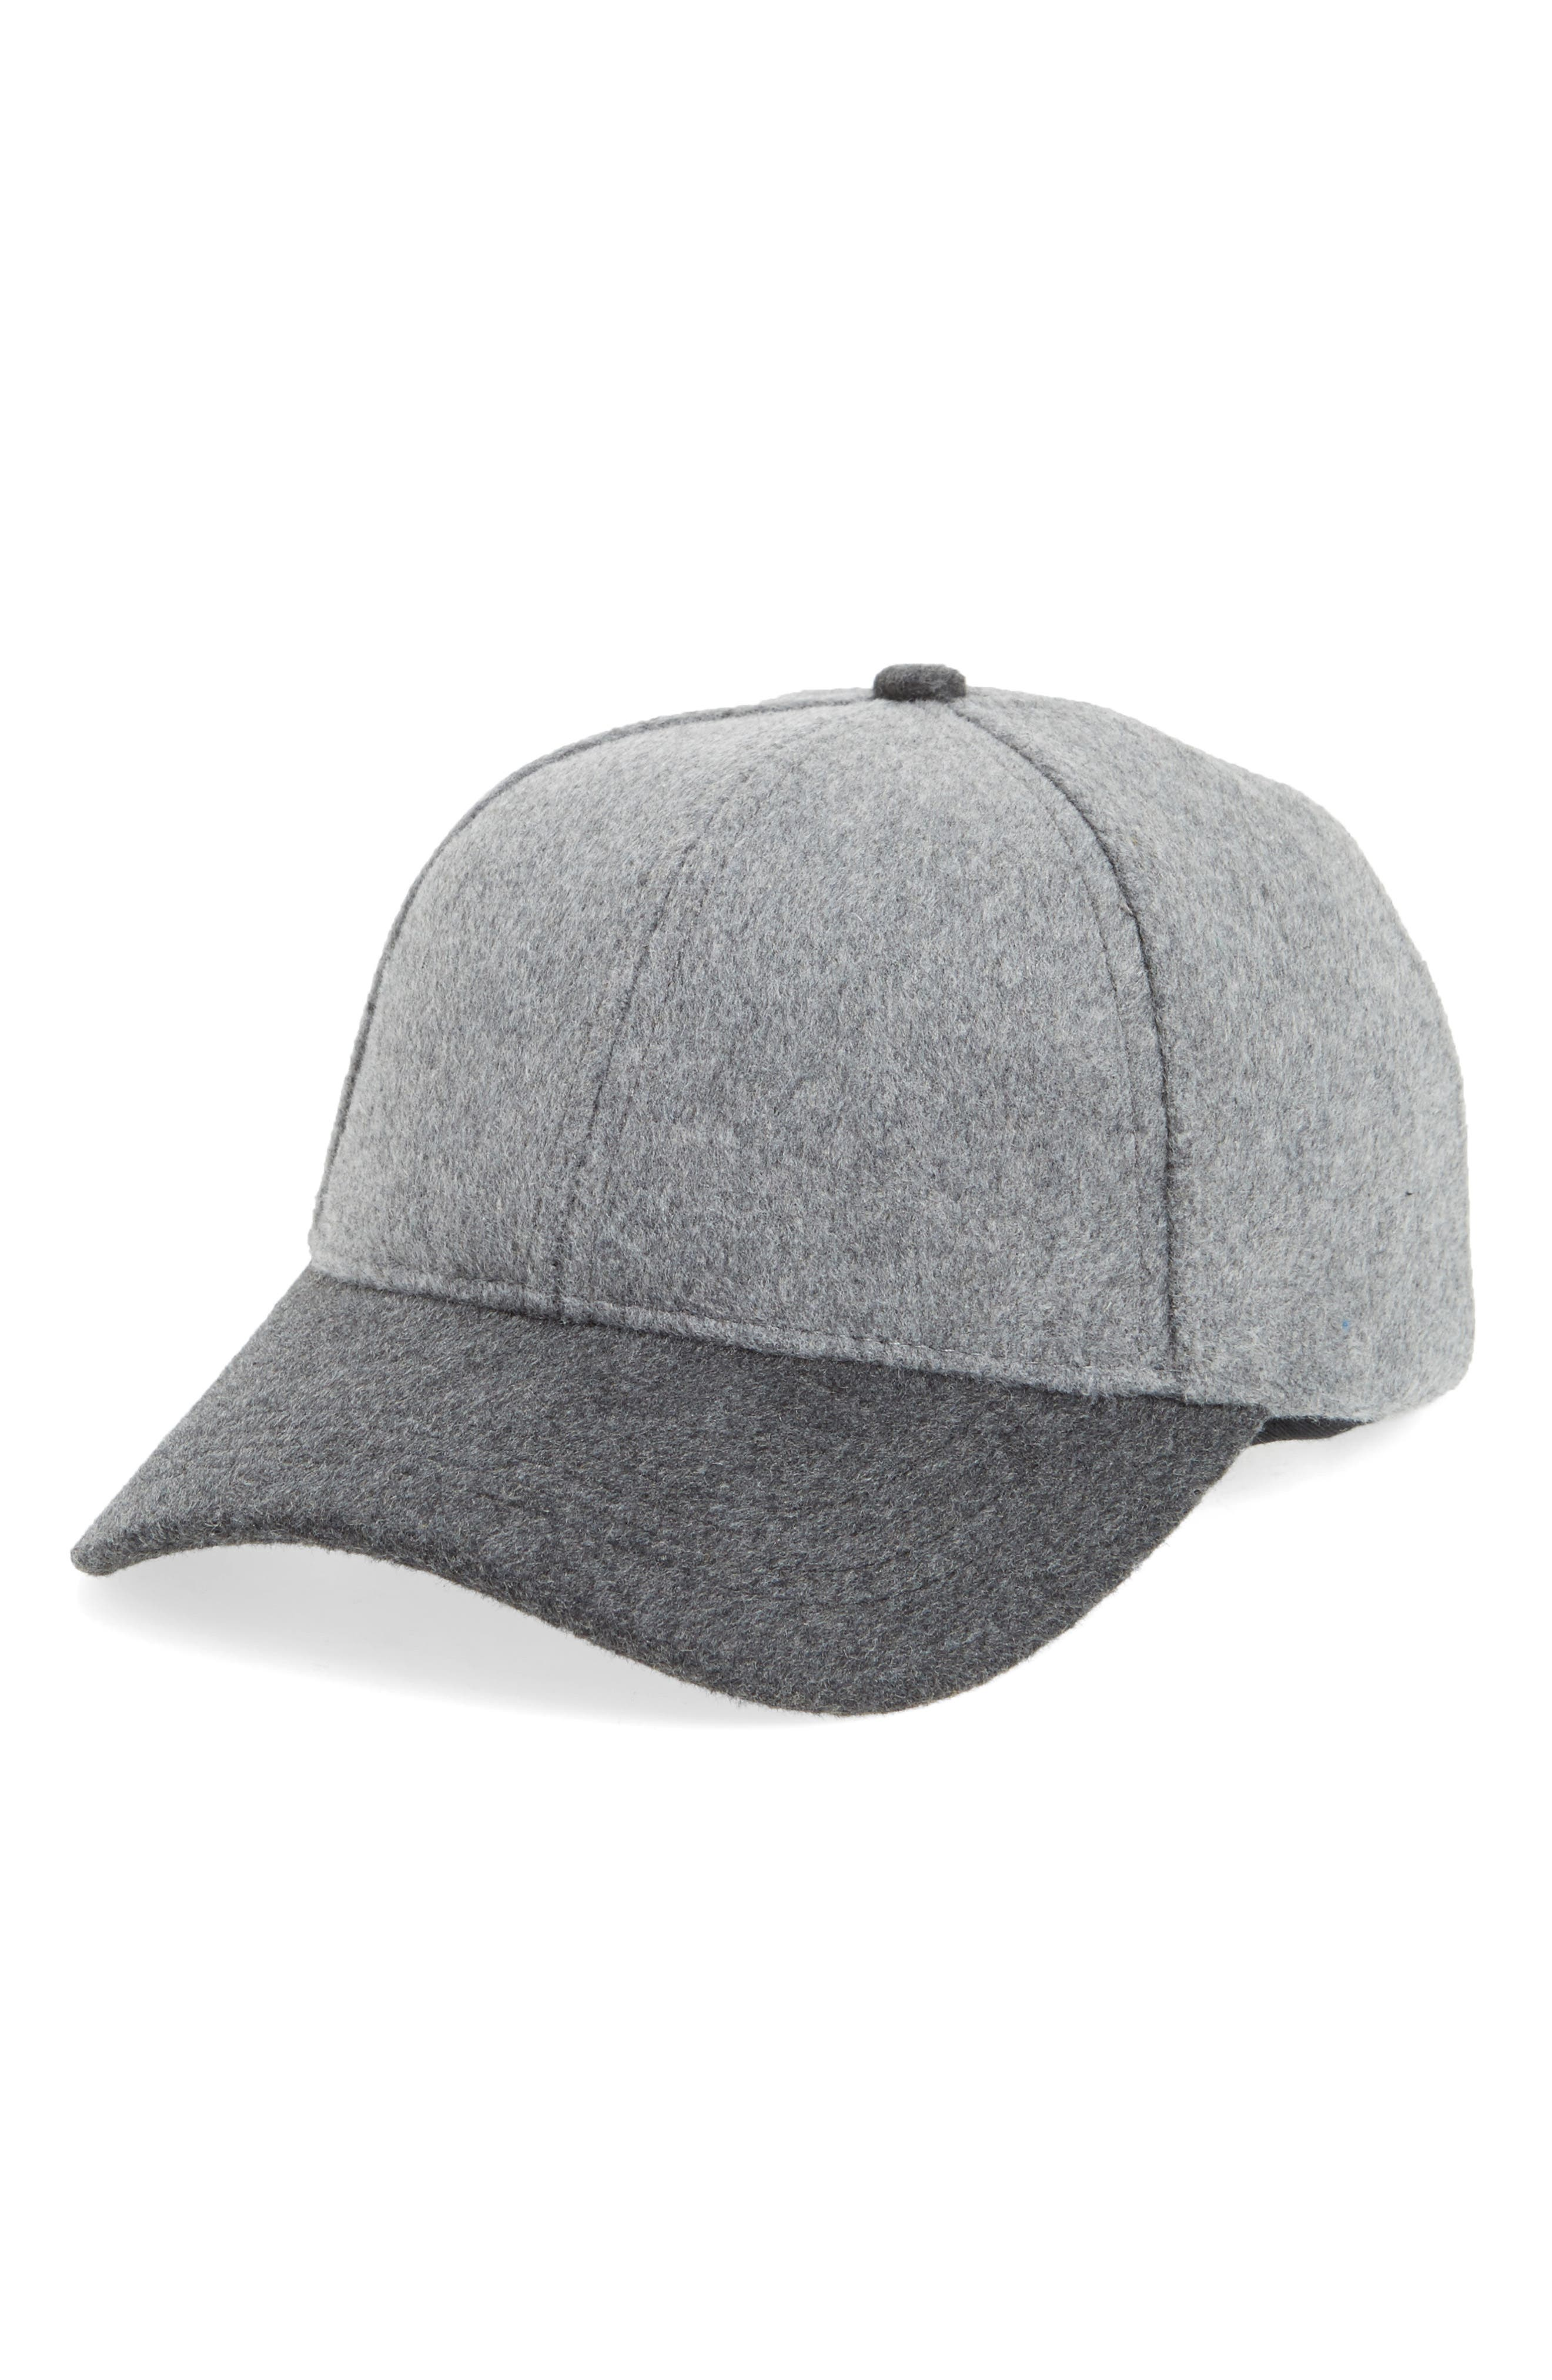 Two-Tone Baseball Cap,                             Main thumbnail 1, color,                             Grey Combo